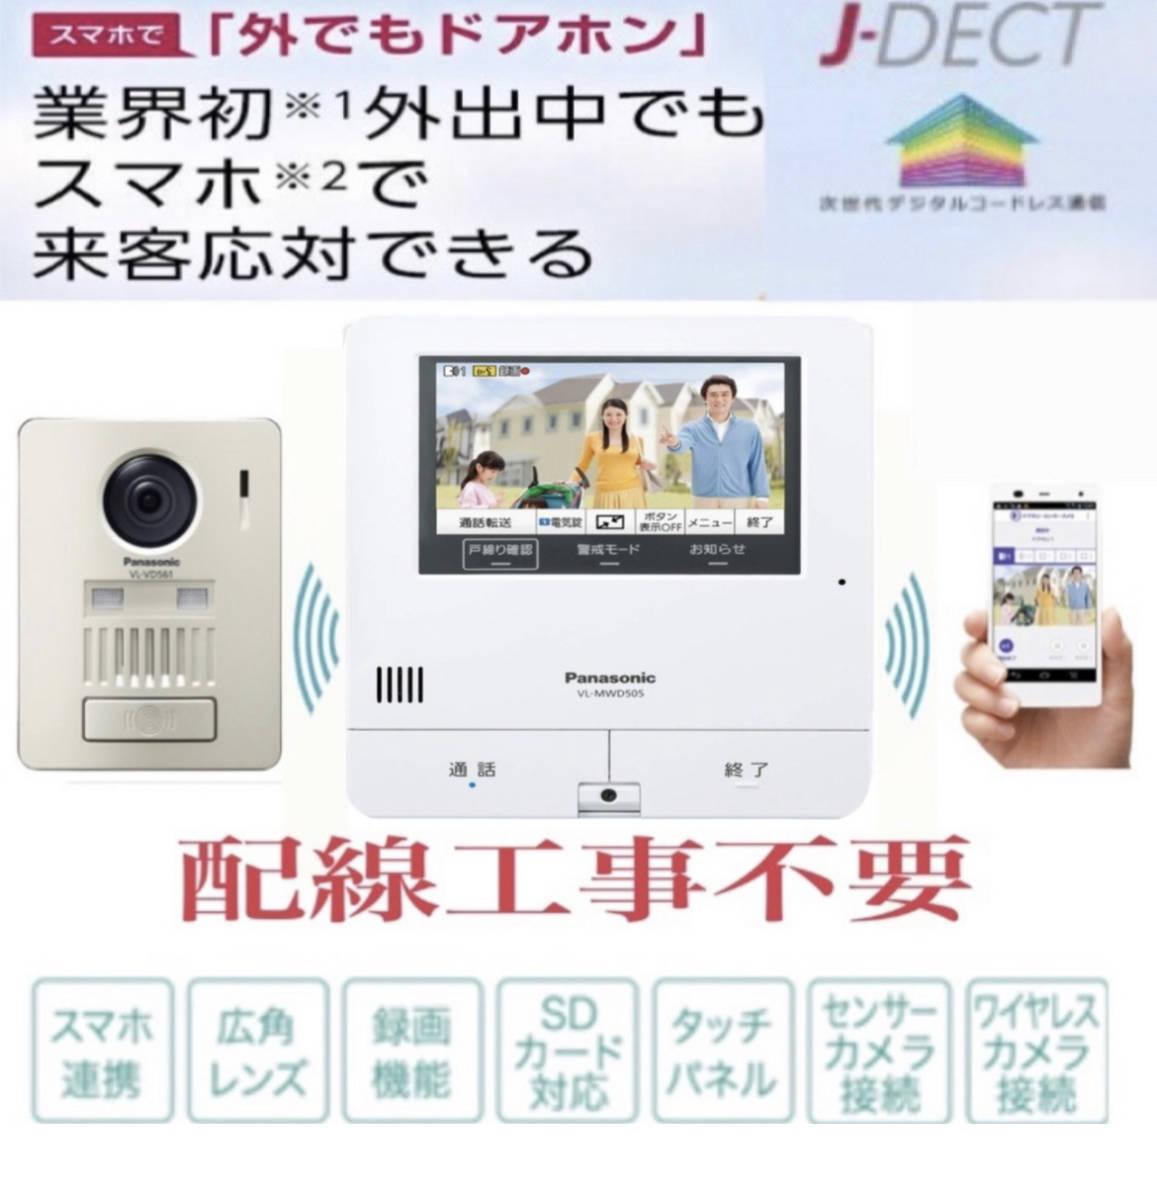 ★VL-SWH505KF★とカラーカメラ玄関子機 VL-VD561L-N Panasonic大画面テレビワイヤレスモニタースマホで来客応対可能 パナソニック_画像1